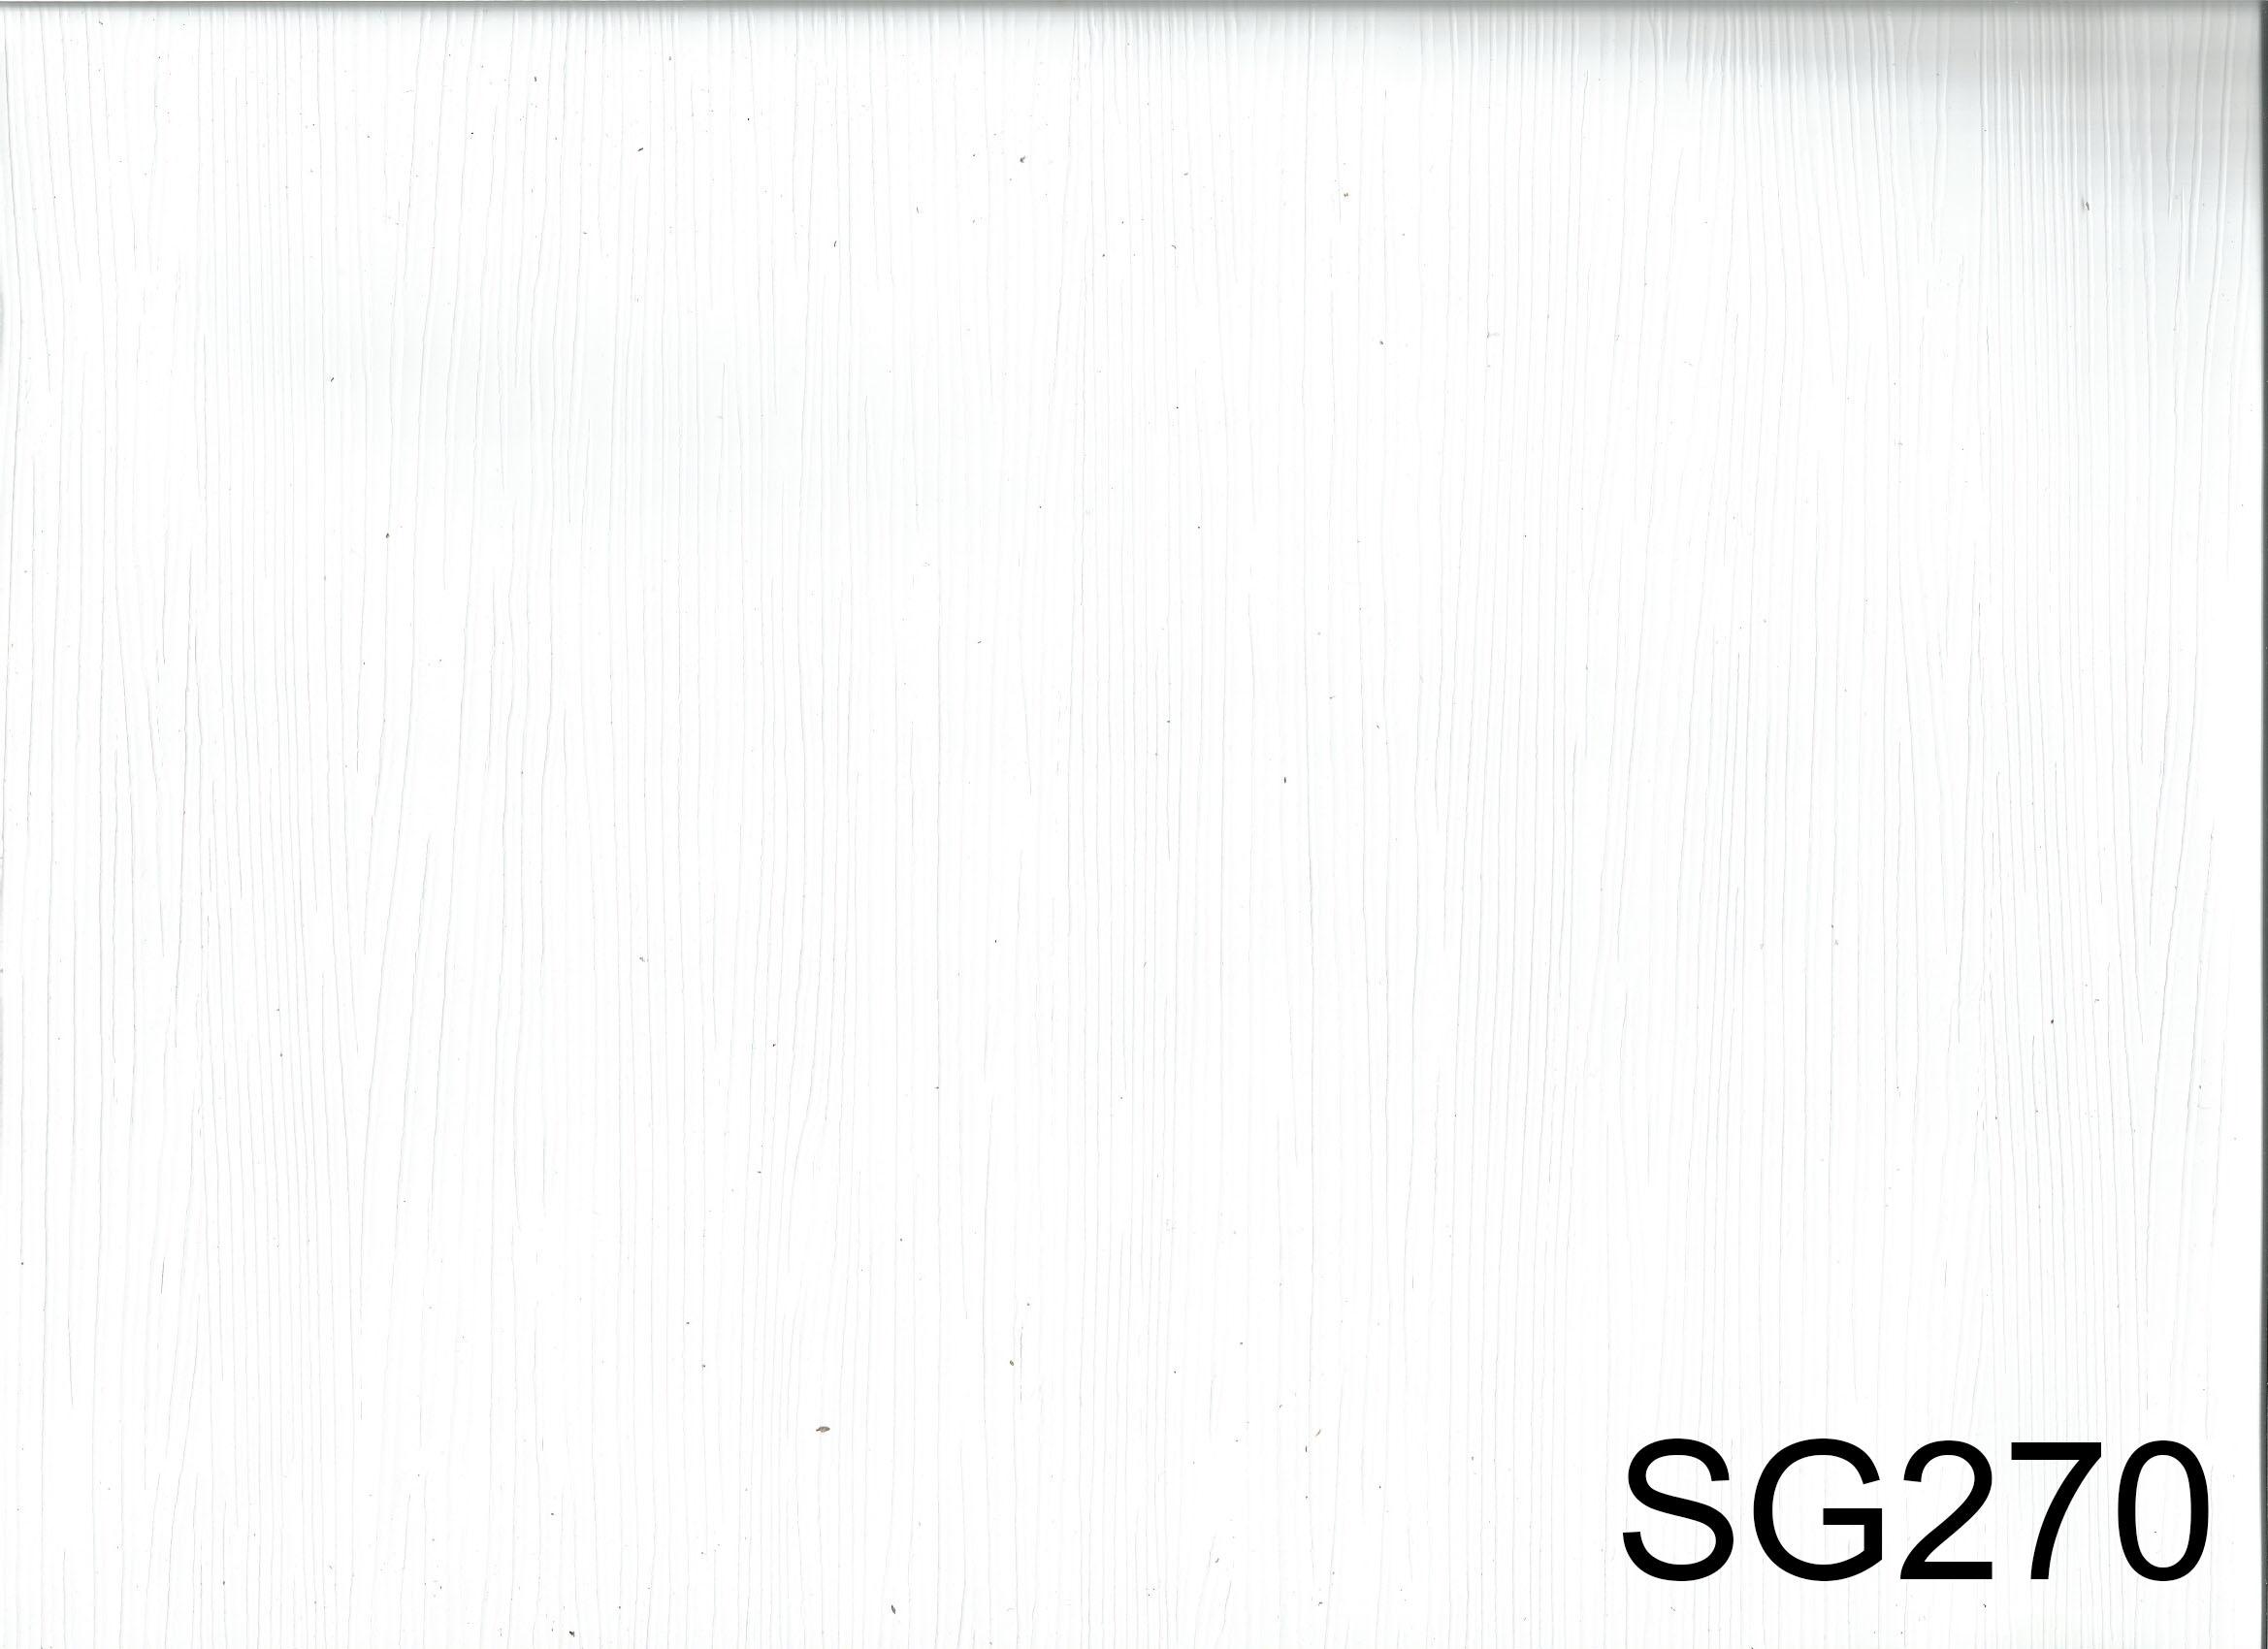 SG270